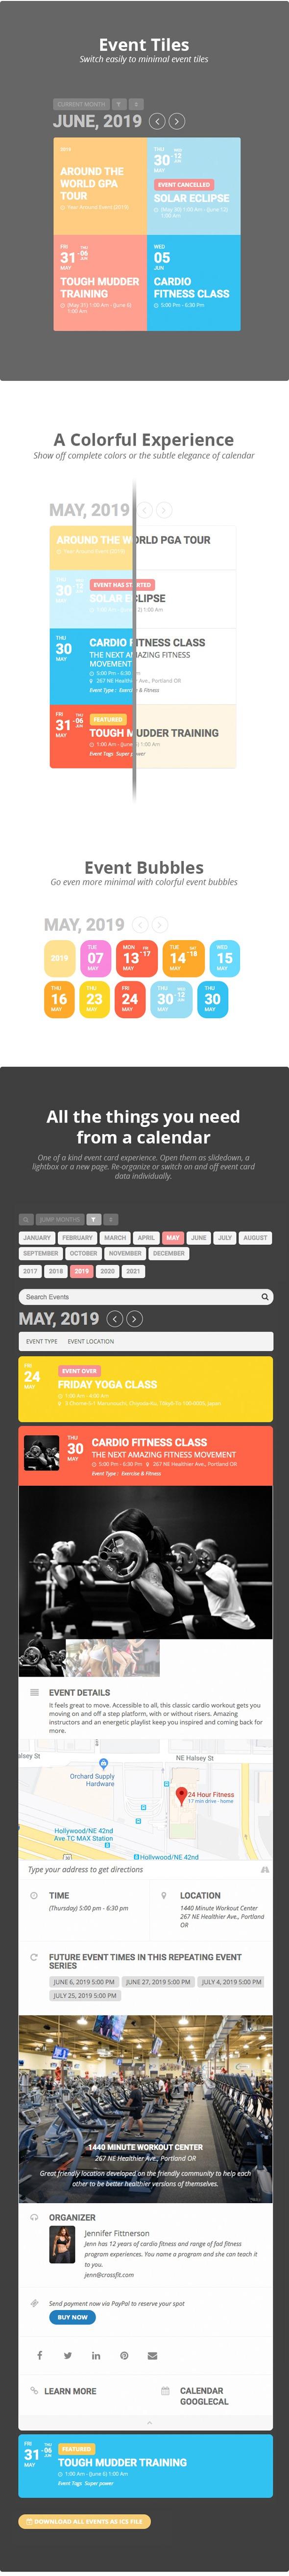 Eventon — WordPress Event Calendar Плагин within Stachethemes Event Calendar